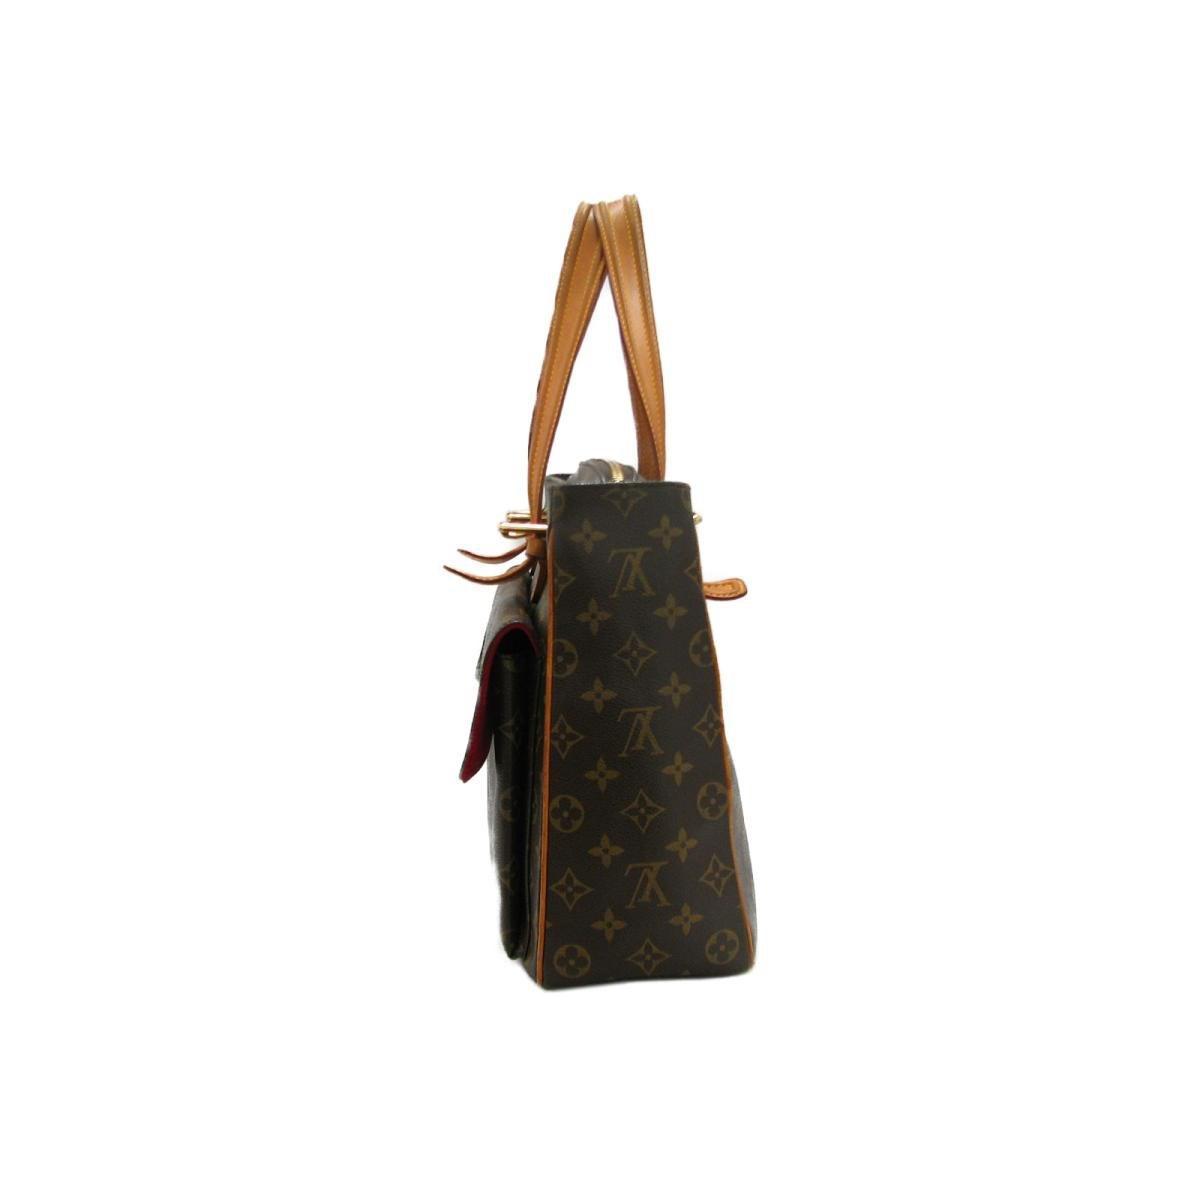 aa4928b28d70 Lyst - Louis Vuitton Authentic Multipli Cite Handbag M51162 Monogram ...